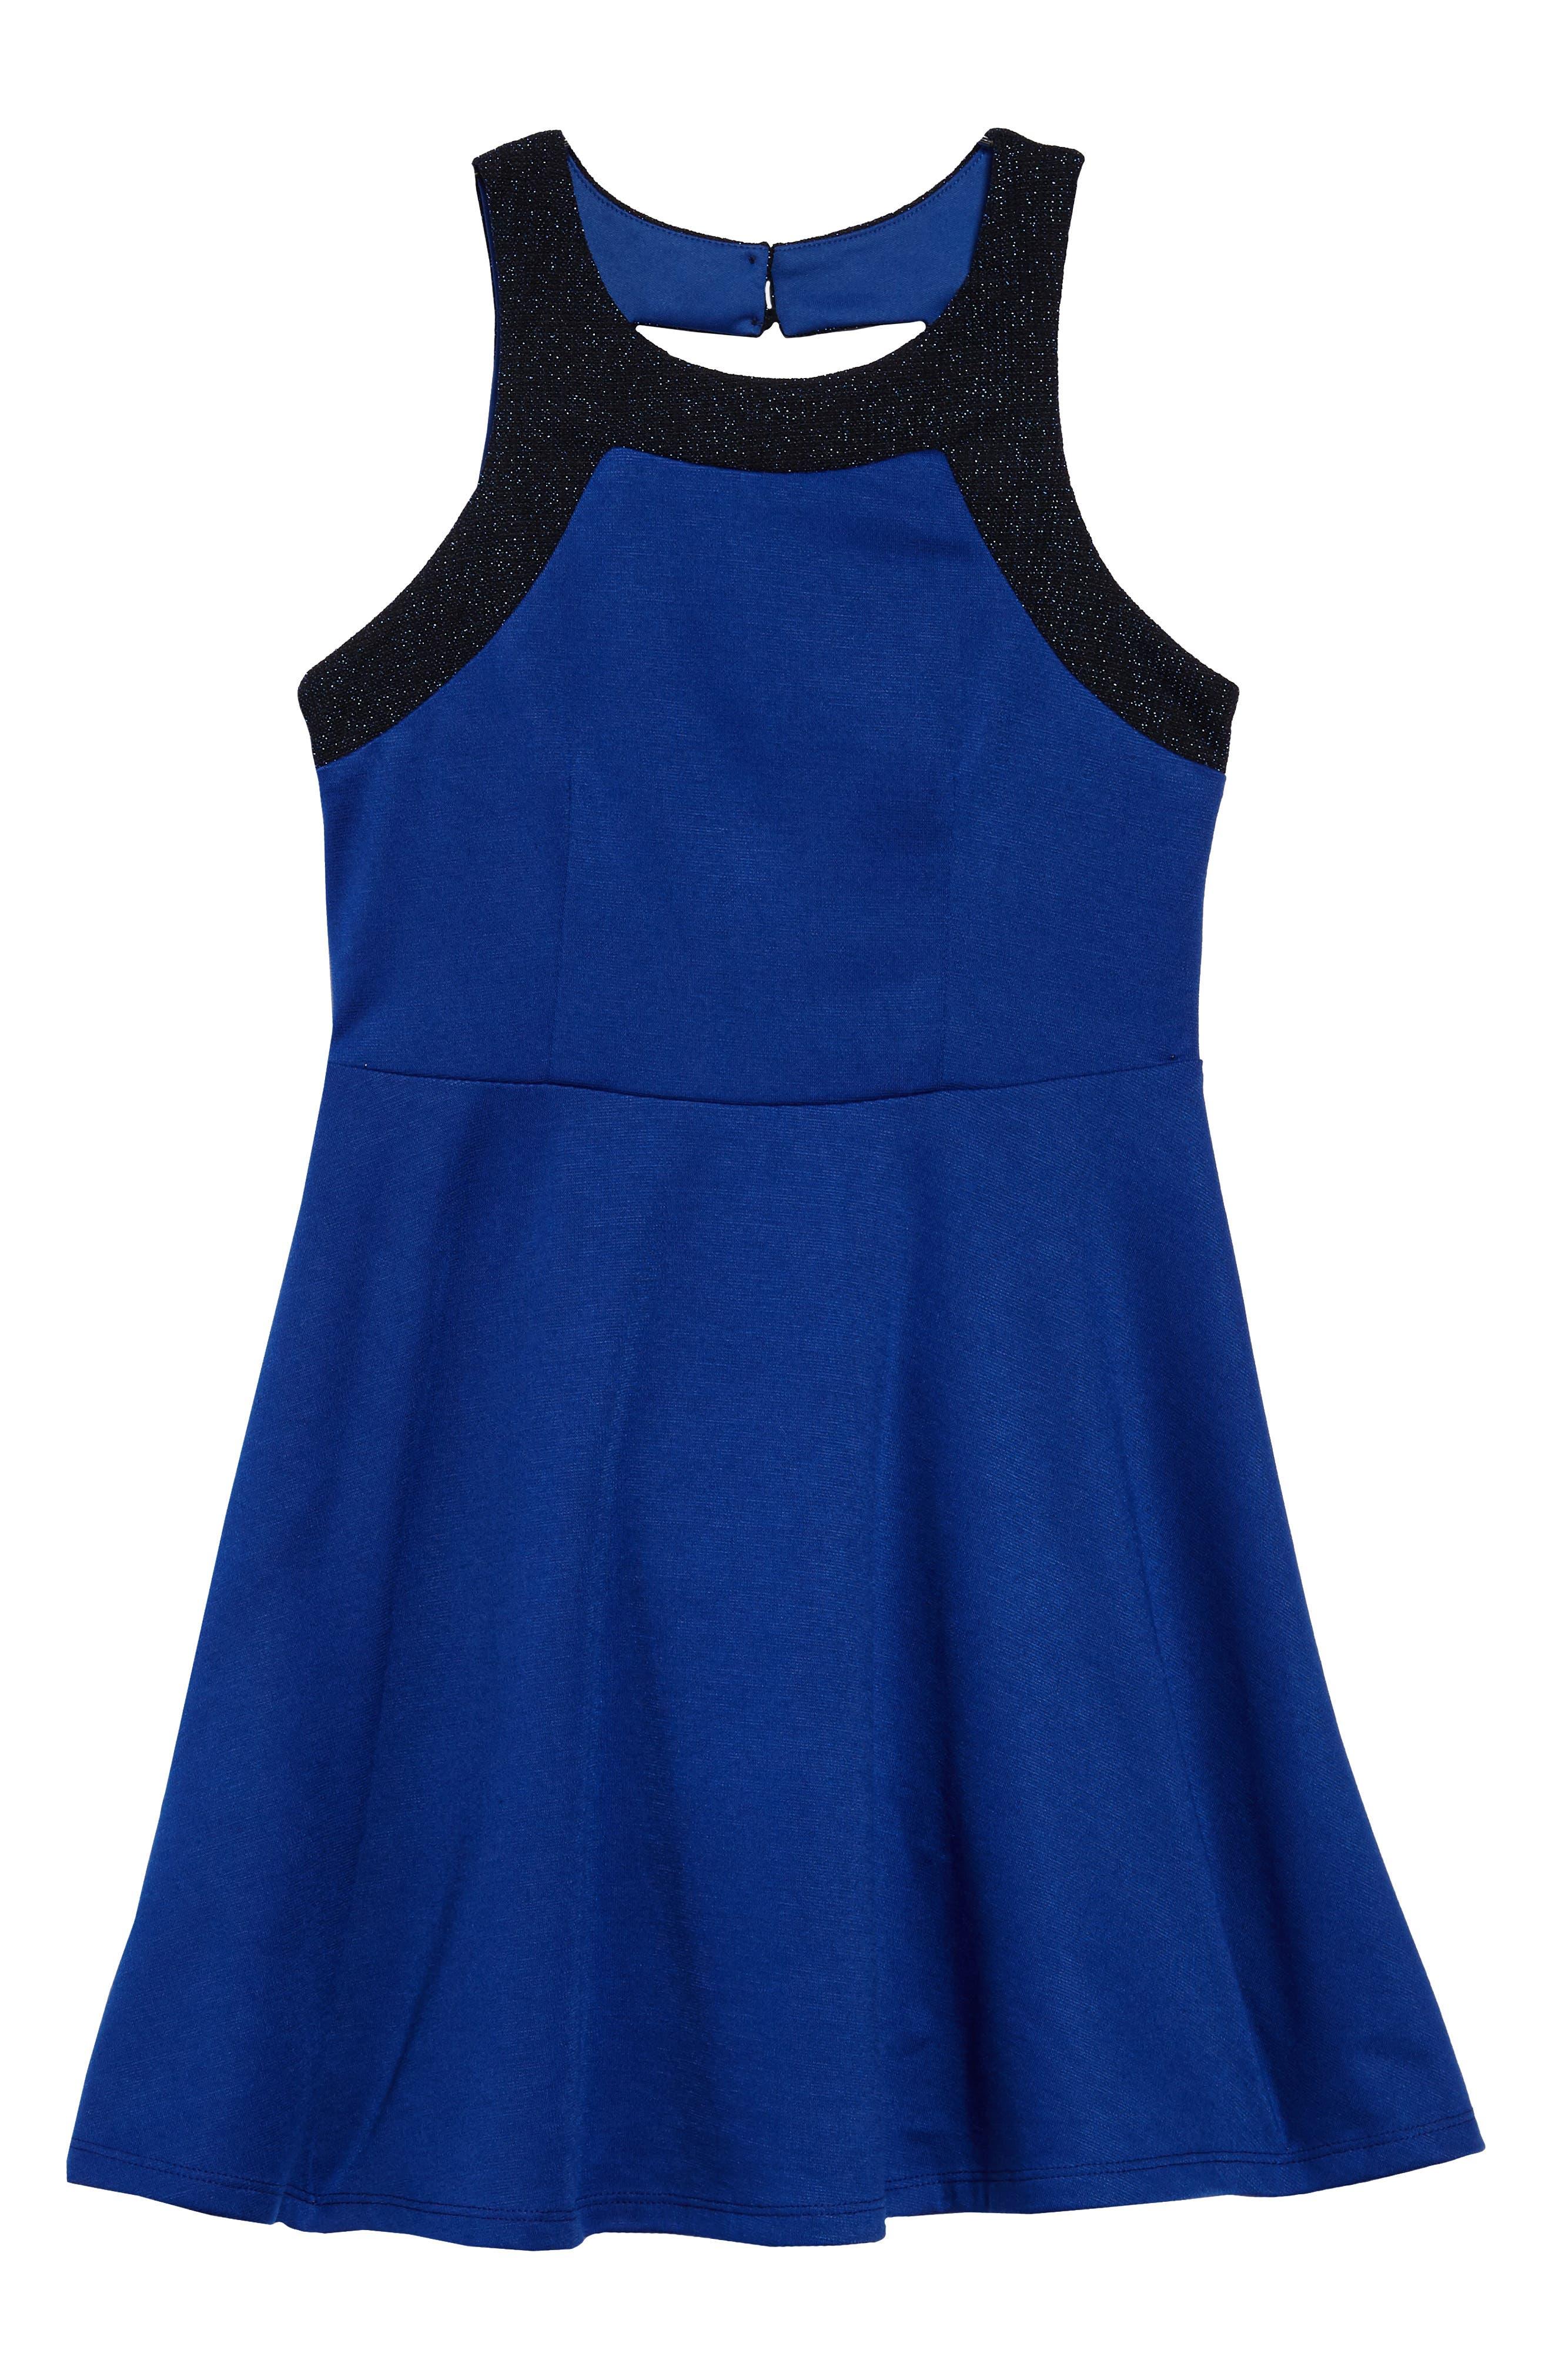 Alternate Image 1 Selected - Penelope Tree Heather Open Back Dress (Big Girls)